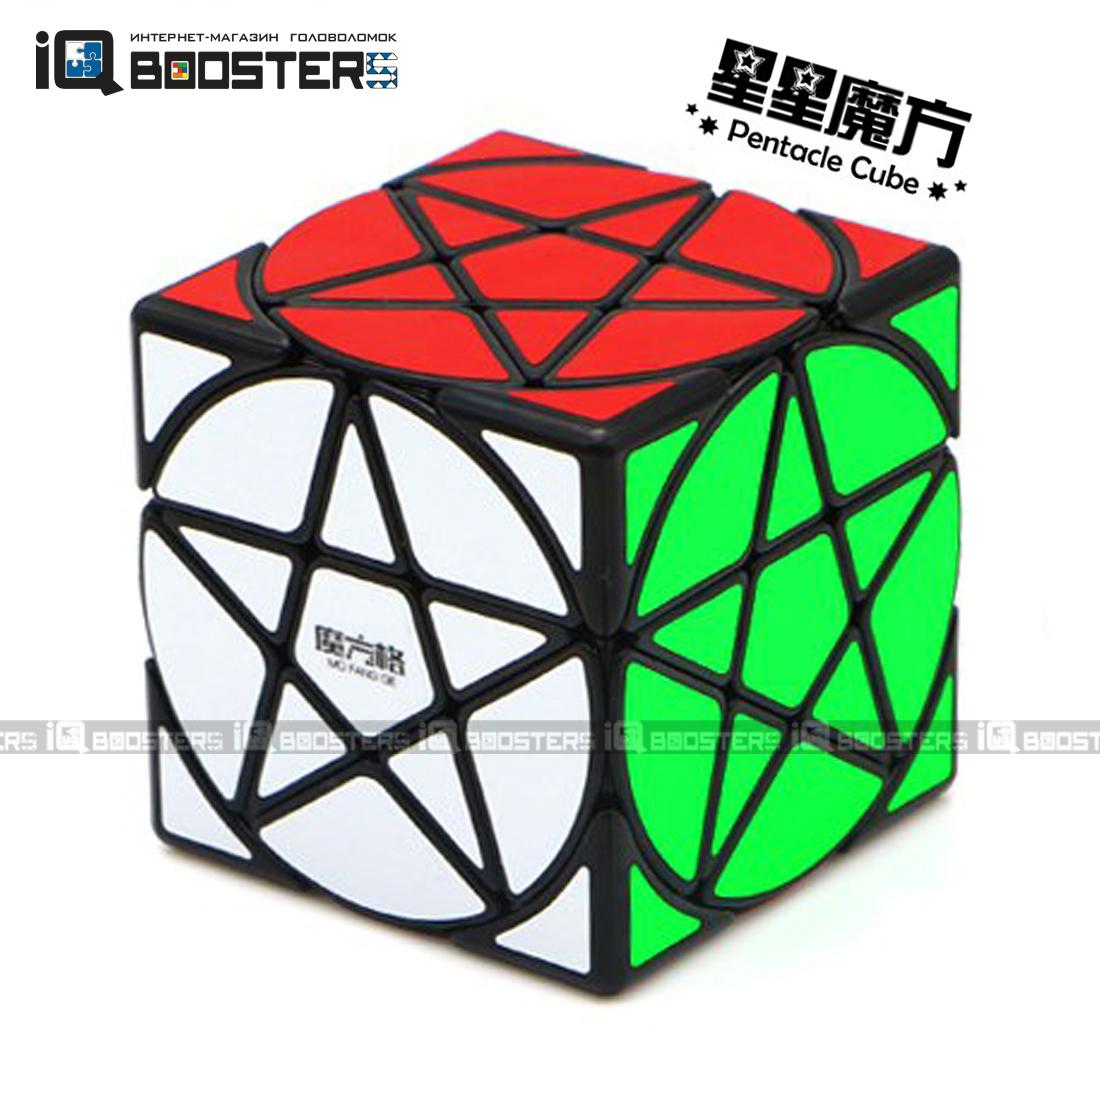 qiyi_pentacle_cube_b1